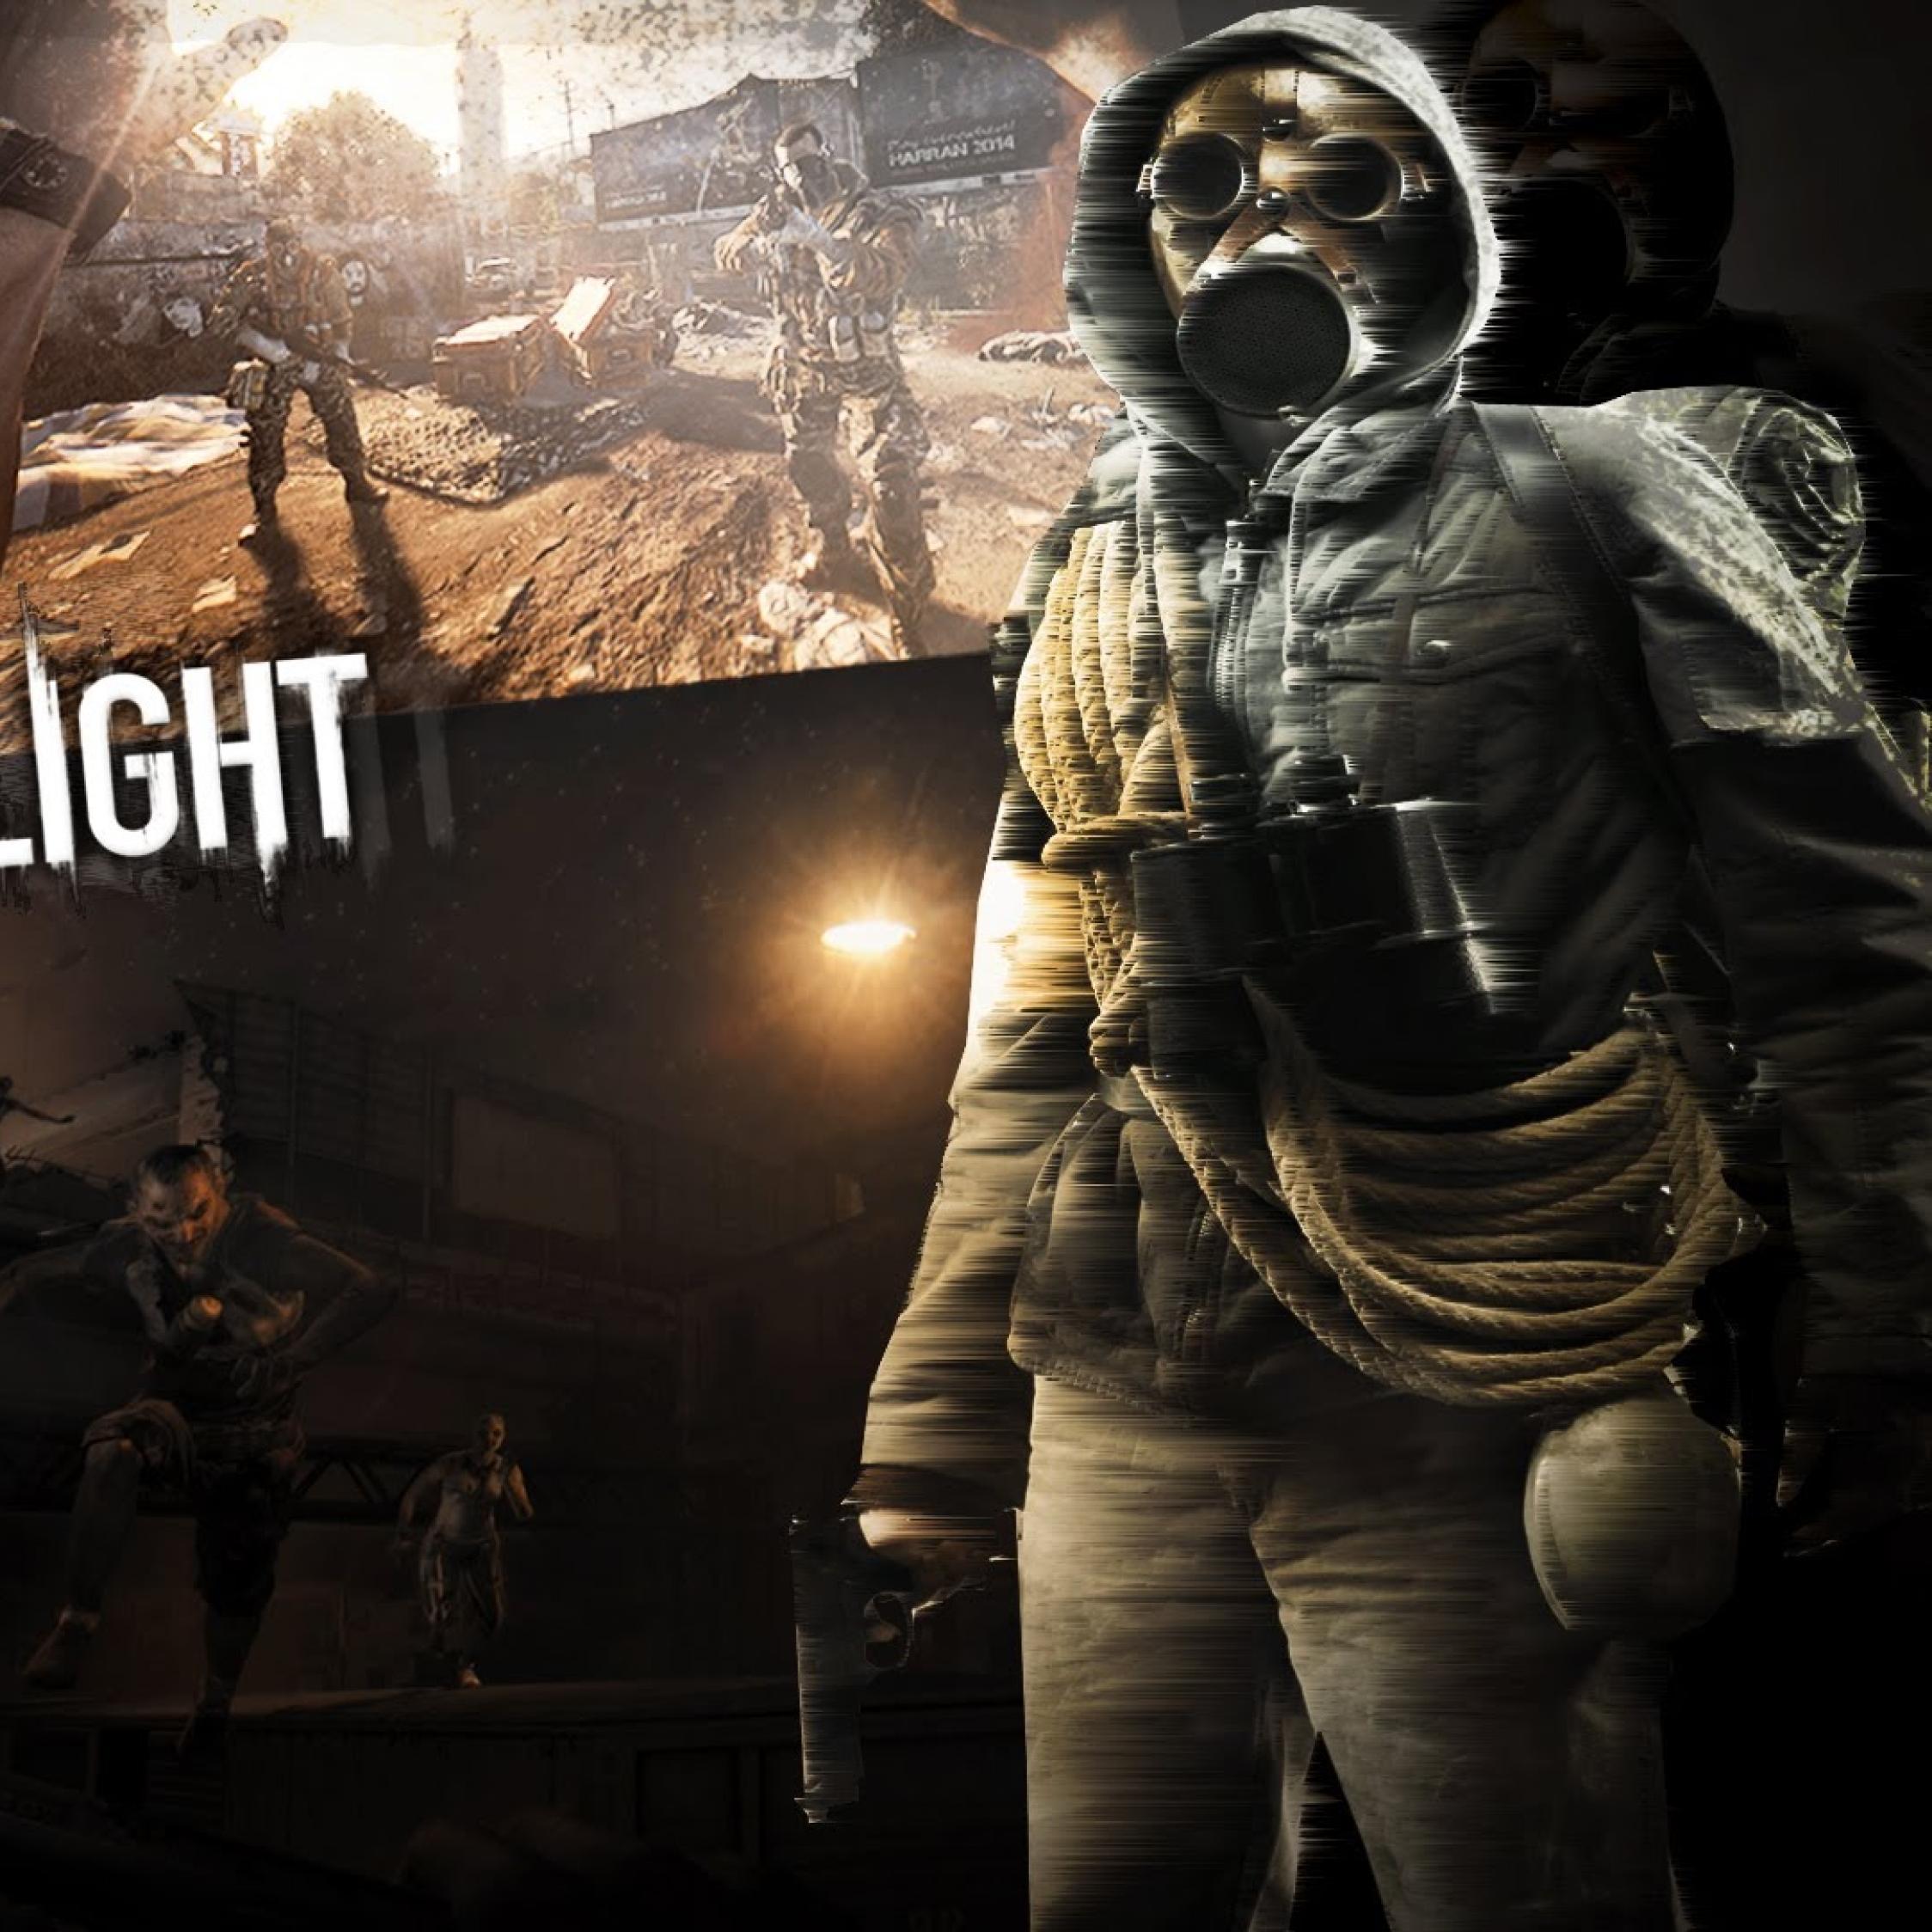 Dying Light Survival Horror Action Full HD Wallpaper